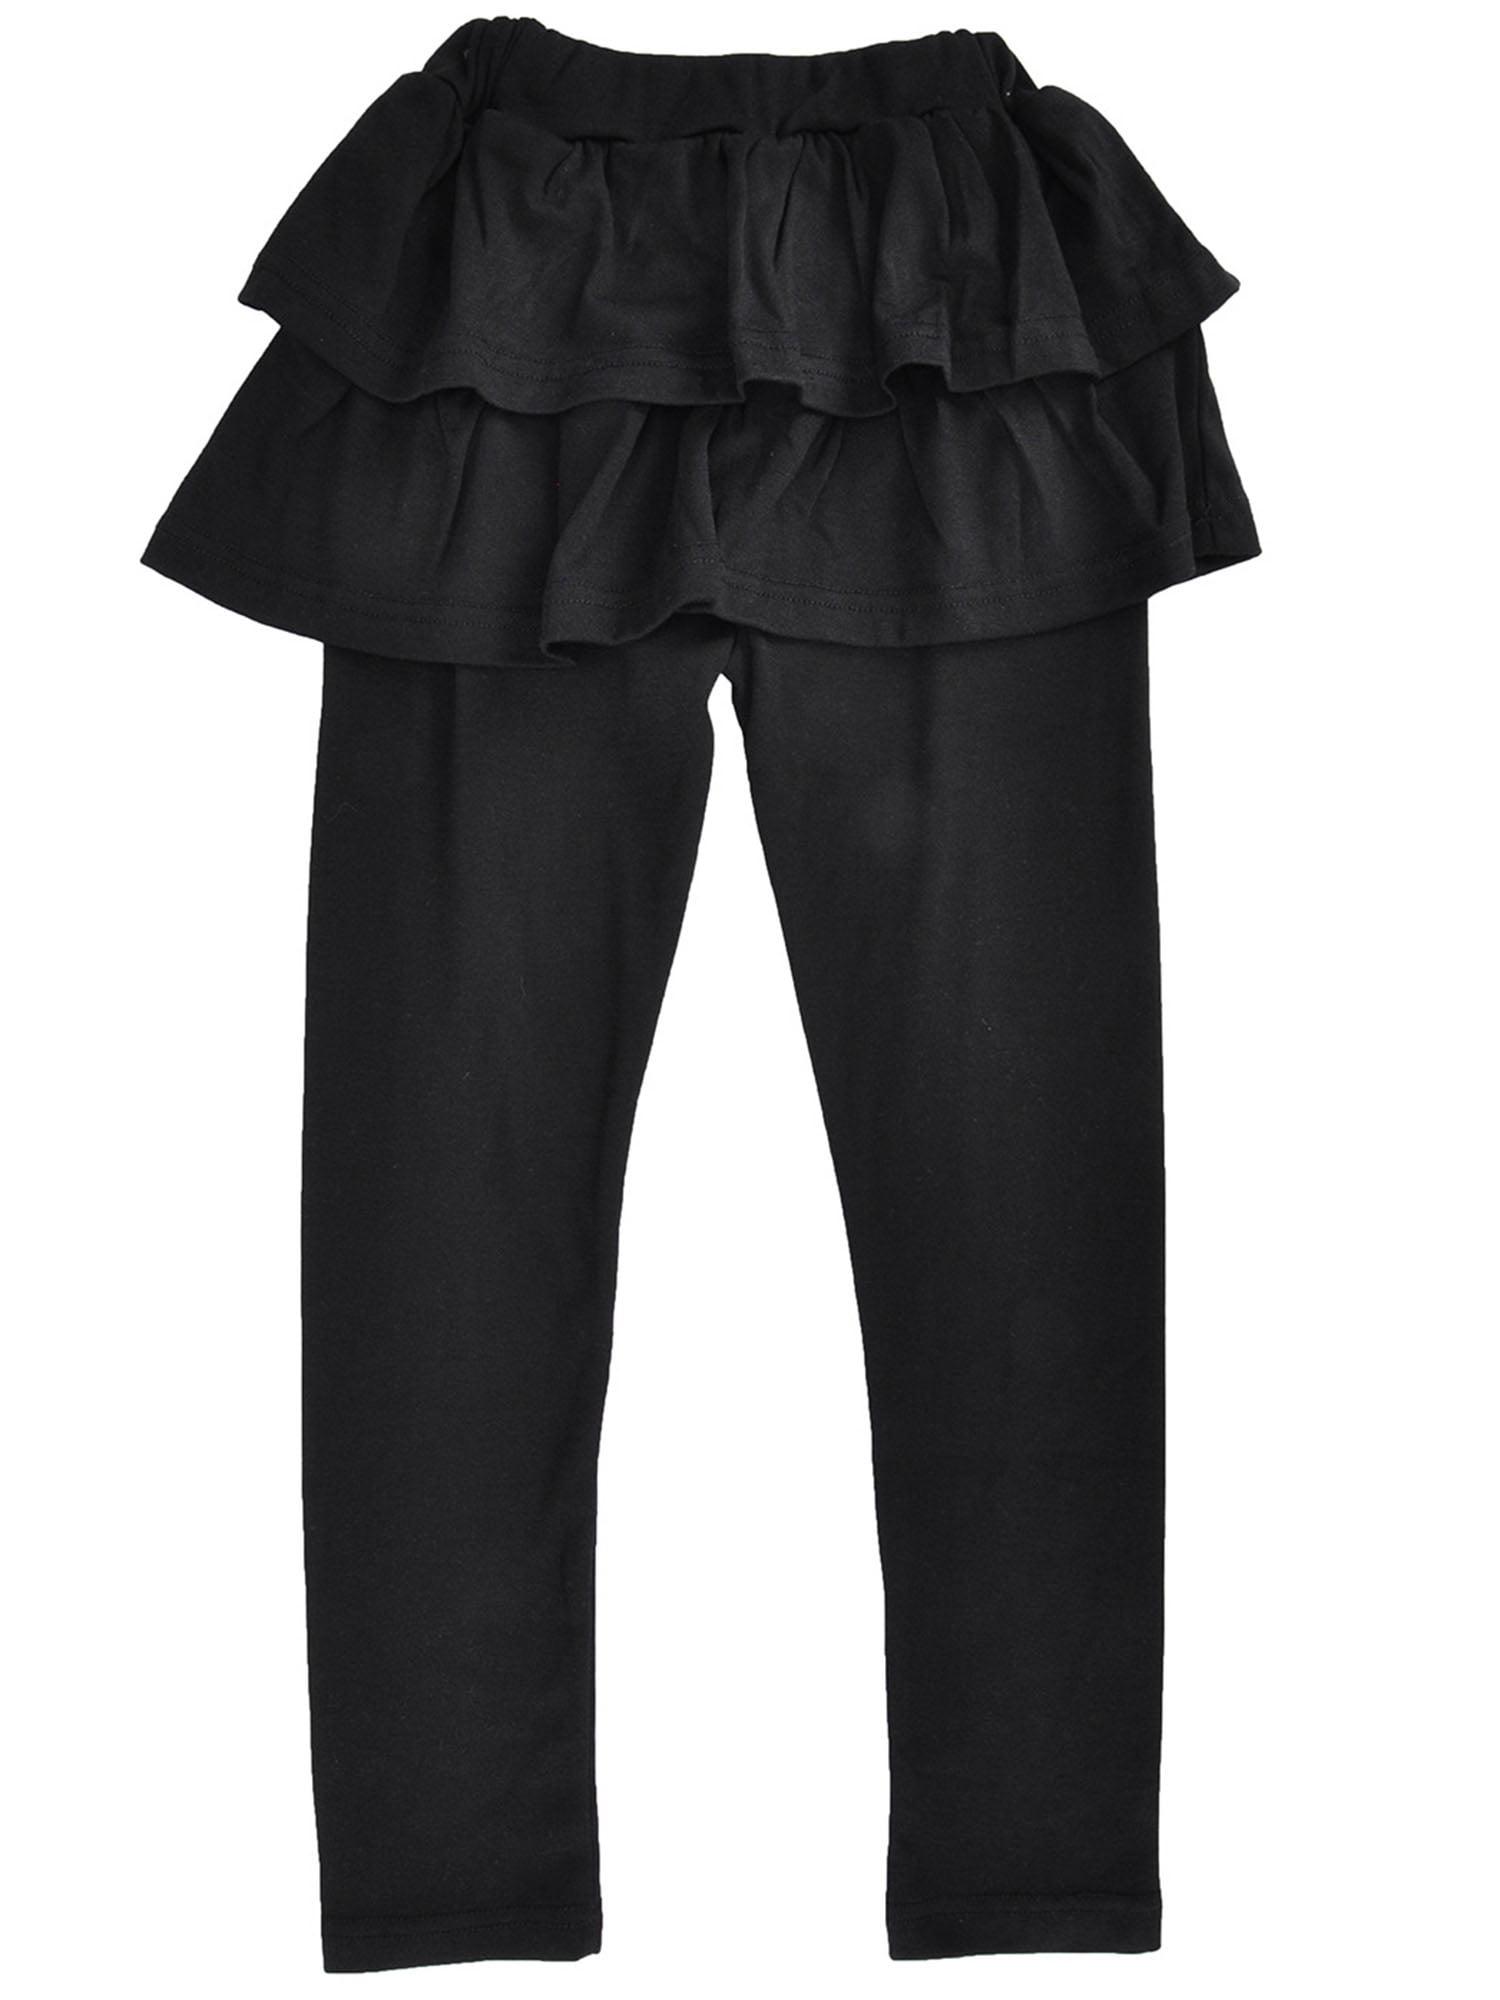 Girls Flouncing Tiered Skirt and Footless Pants,Elastic Waist, Black,4